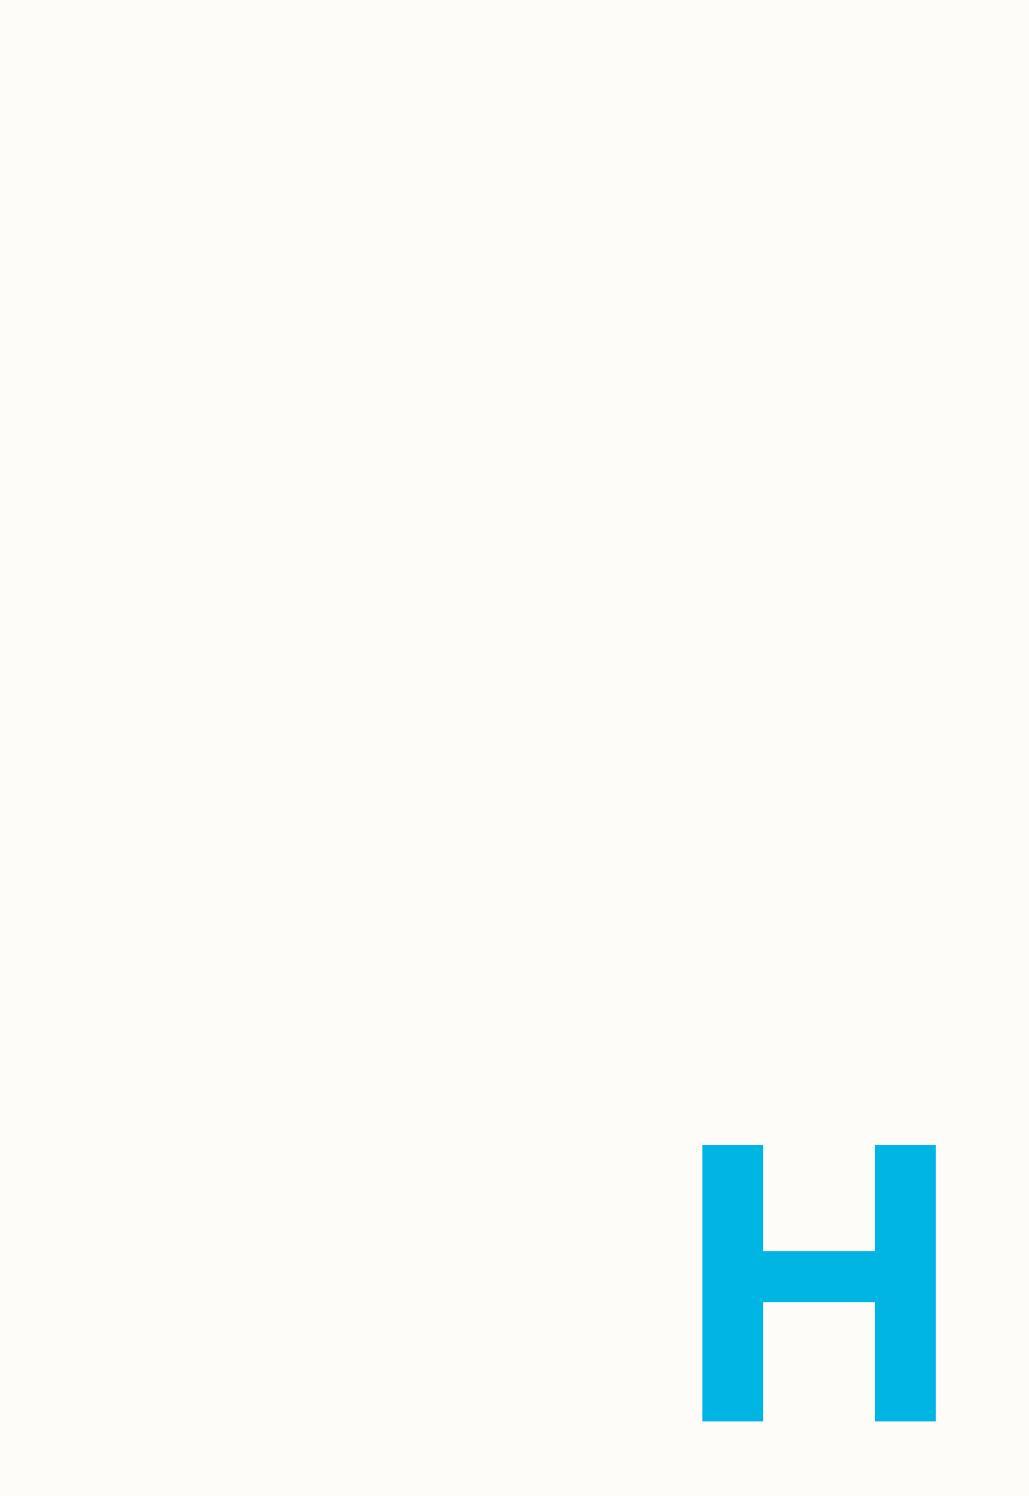 Helvetica Neue Type Specimen Book by Corinne Ferman - issuu